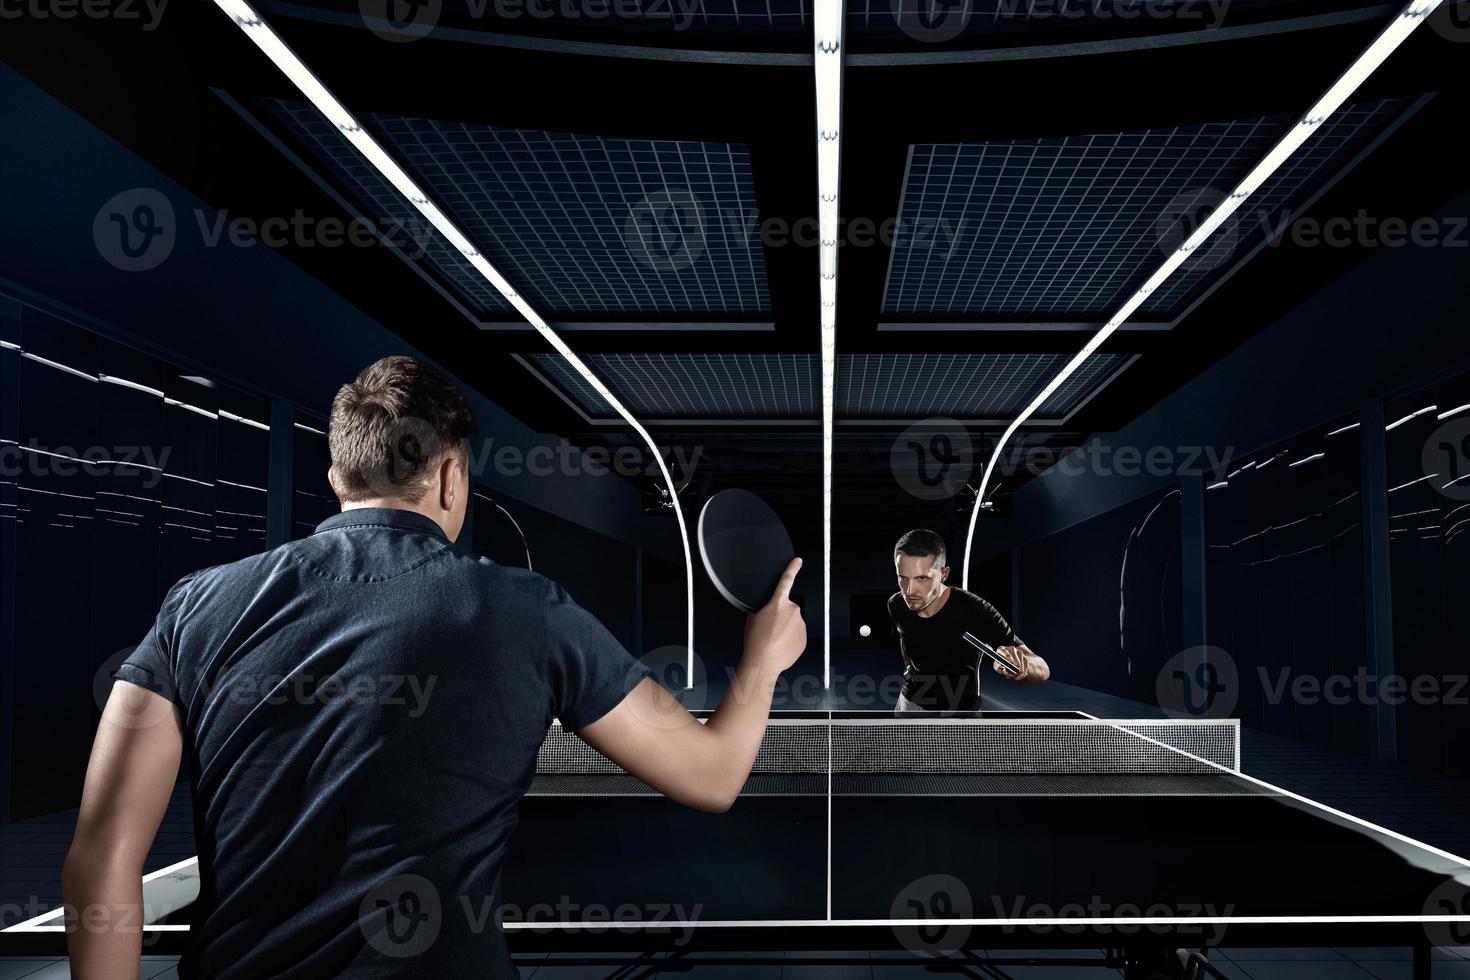 des sports. tennis de table, ping-pong, sparring. photo